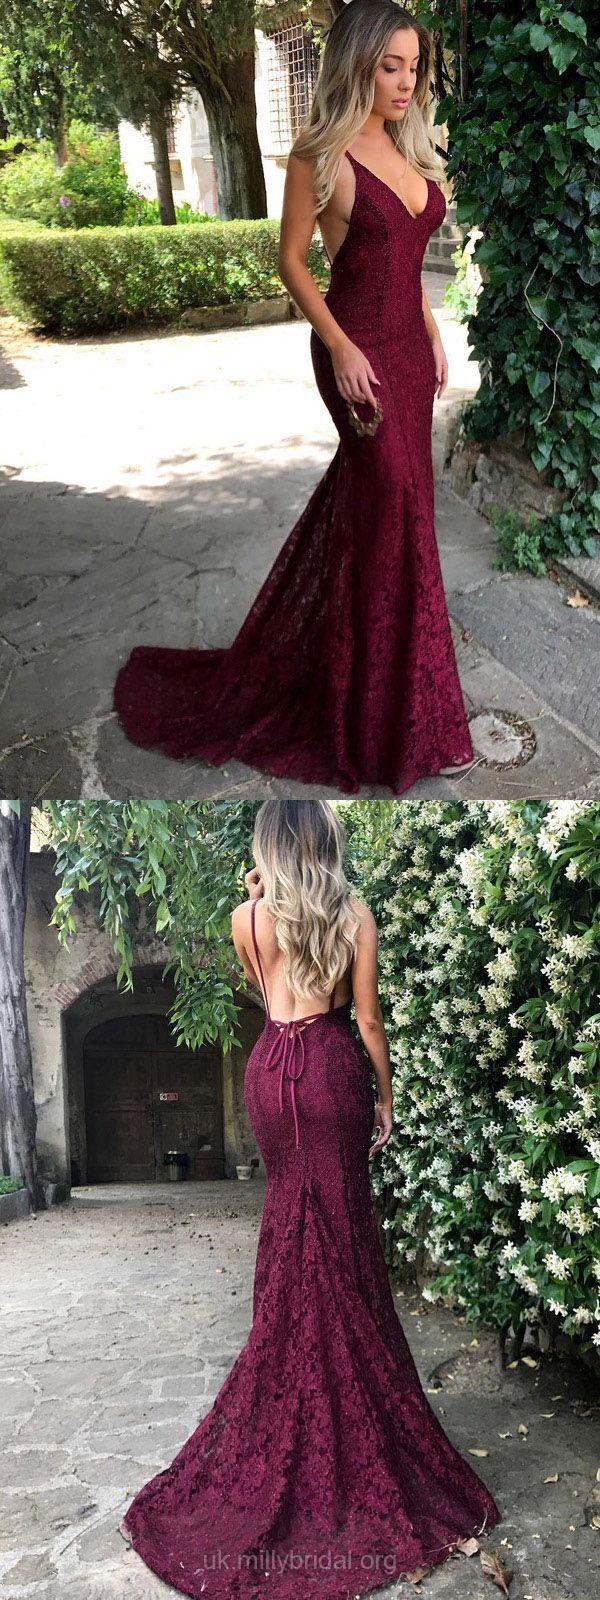 Burgundy Prom Dresses,Long Prom Dresses,Lace Prom Dresses,V-neck Prom Dresses,Trumpet/Mermaid Prom Dresses,Modest Prom Dresses 2018 #partydress